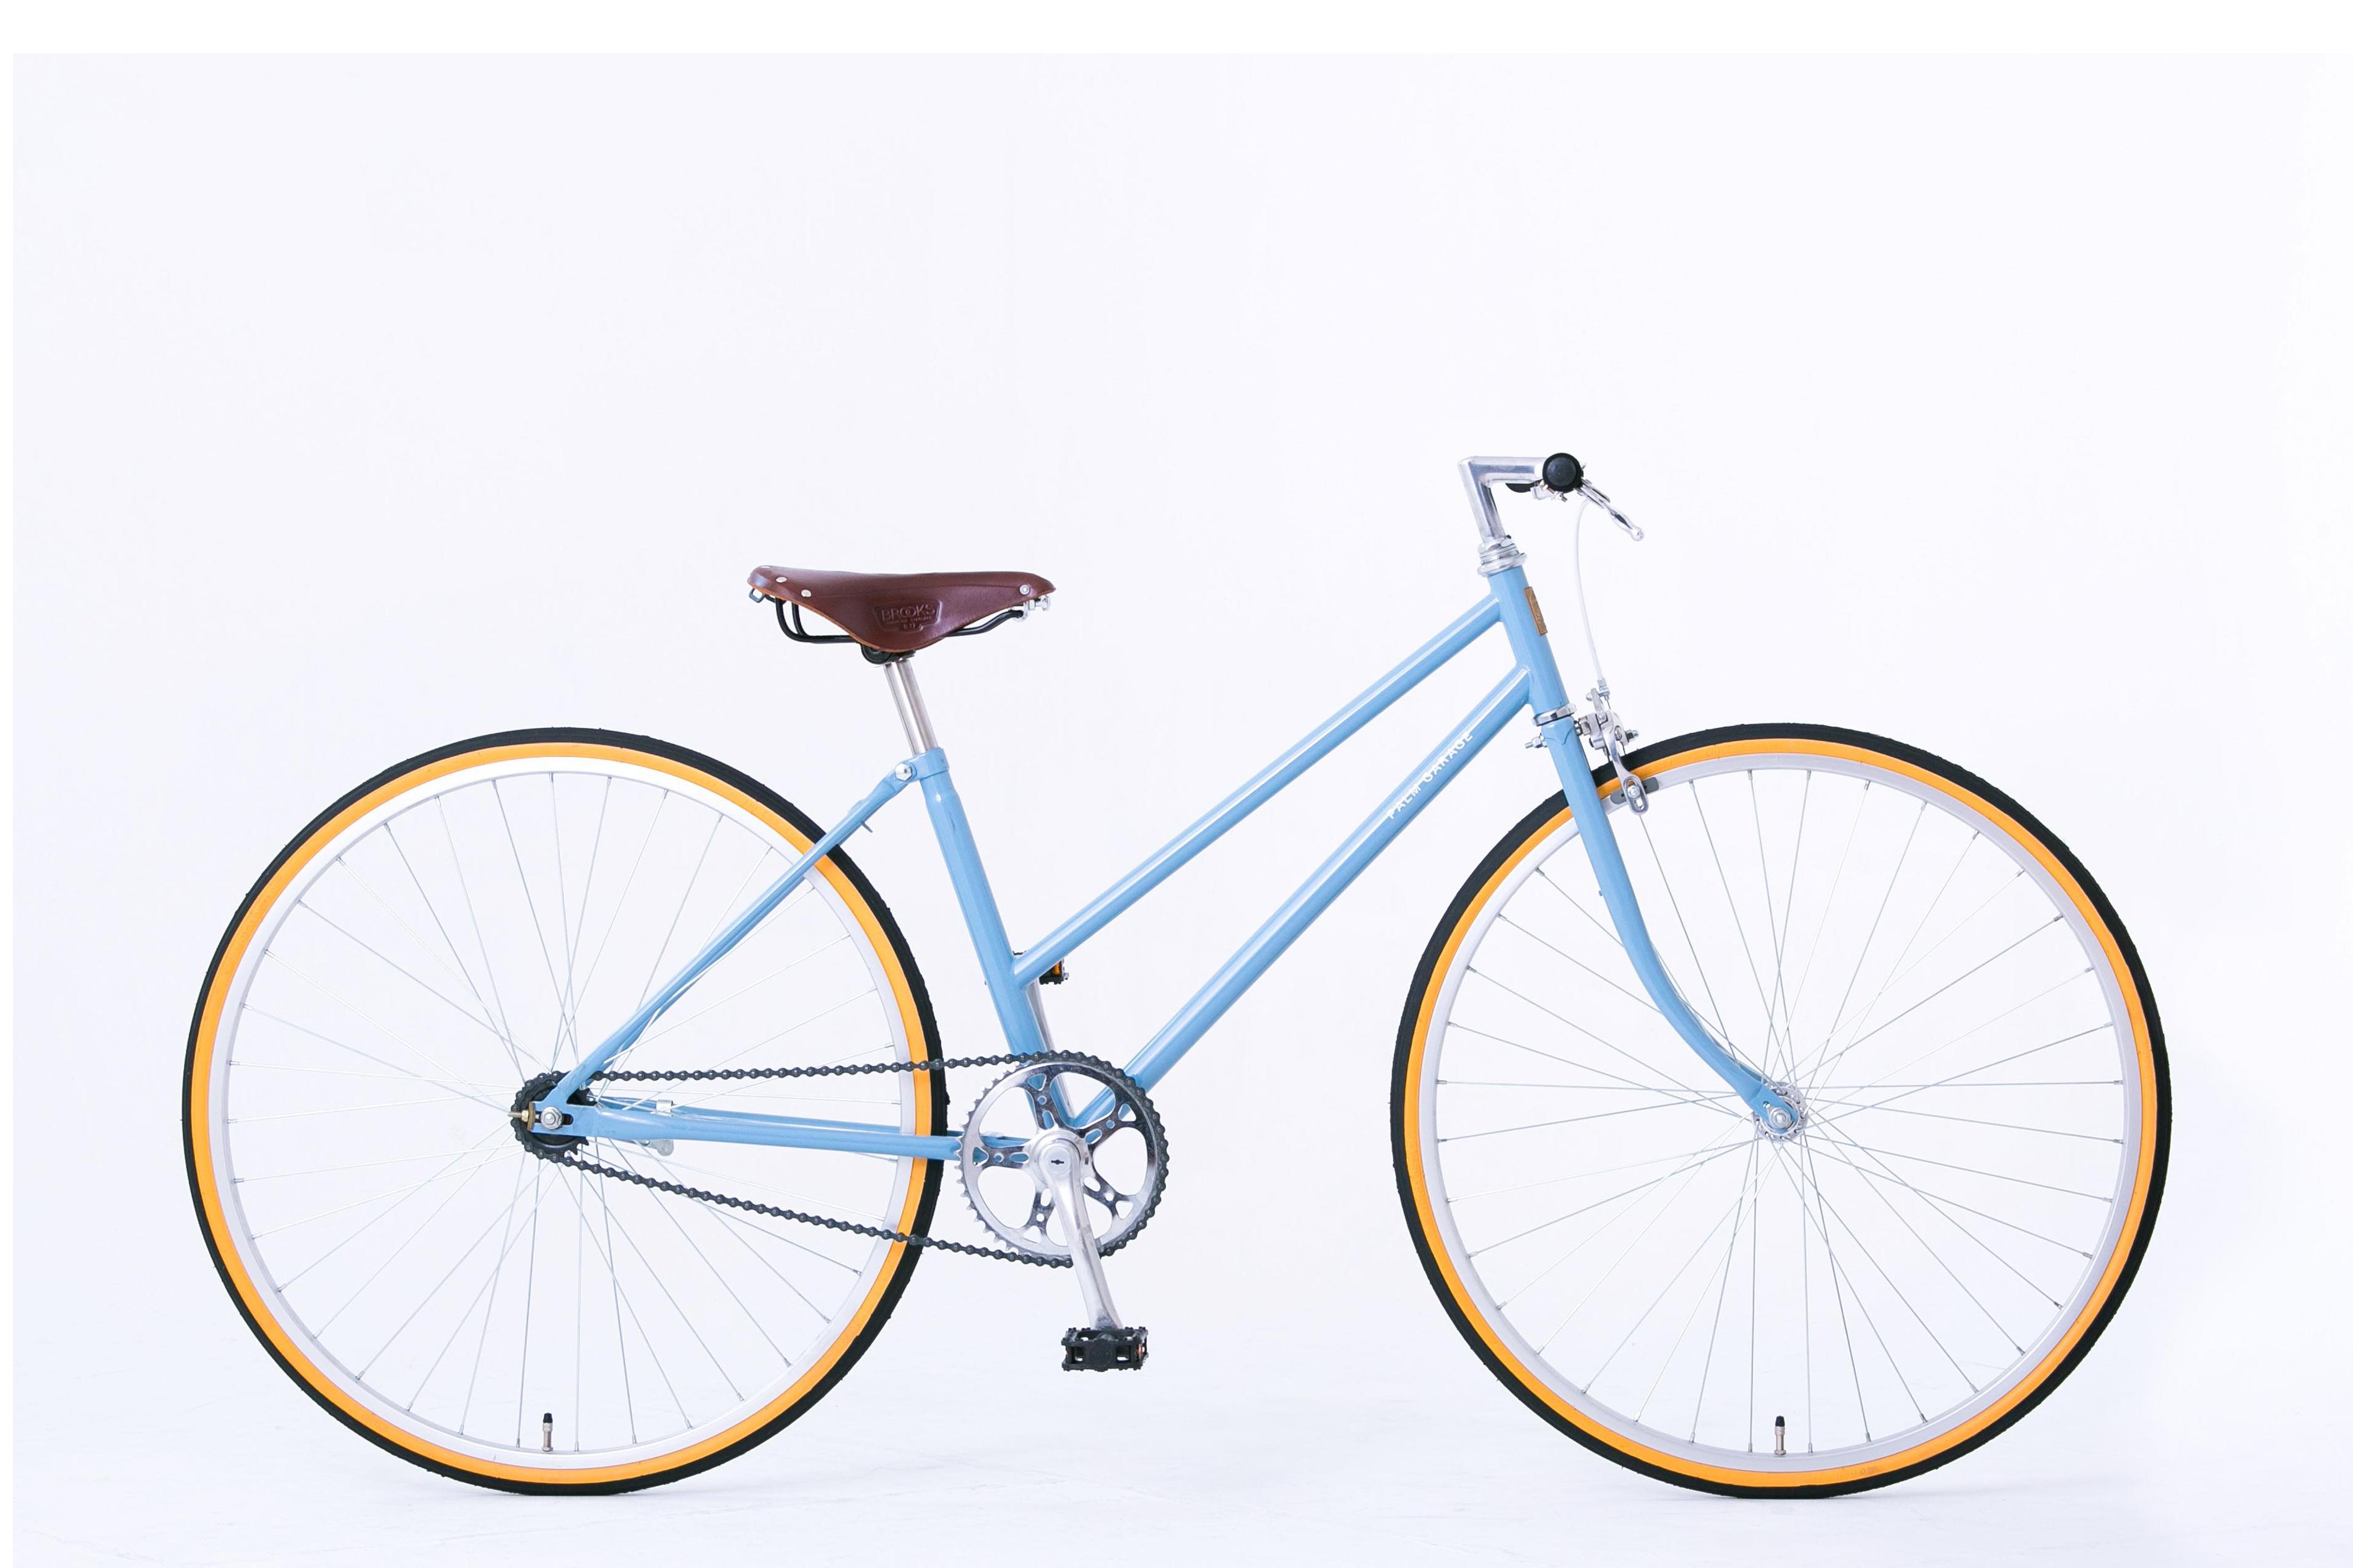 PG_bikes_01.jpg